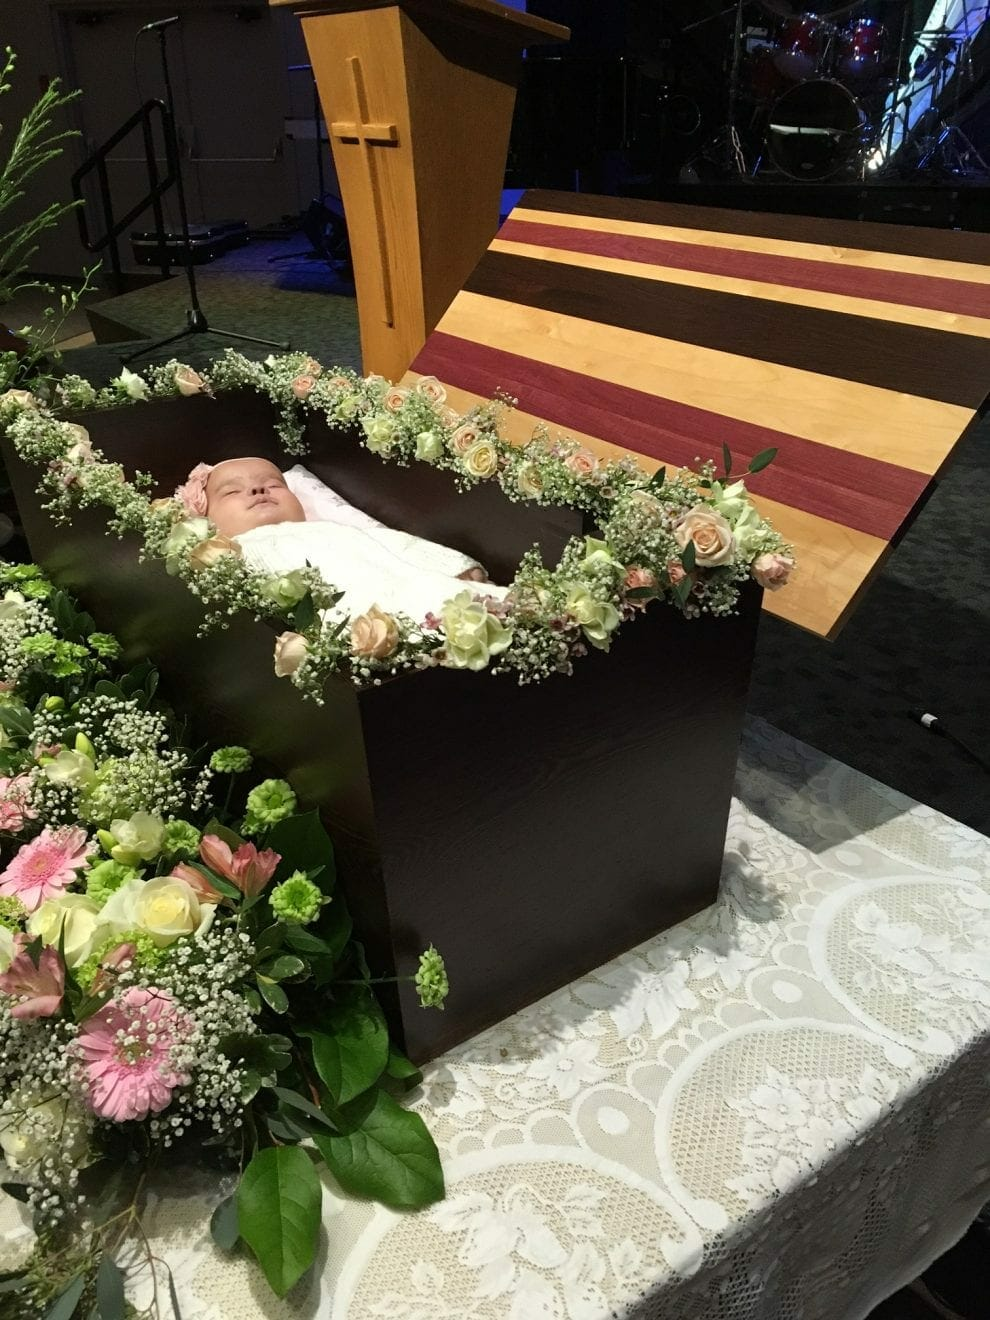 Eli-Grace's father Michael built her casket himself